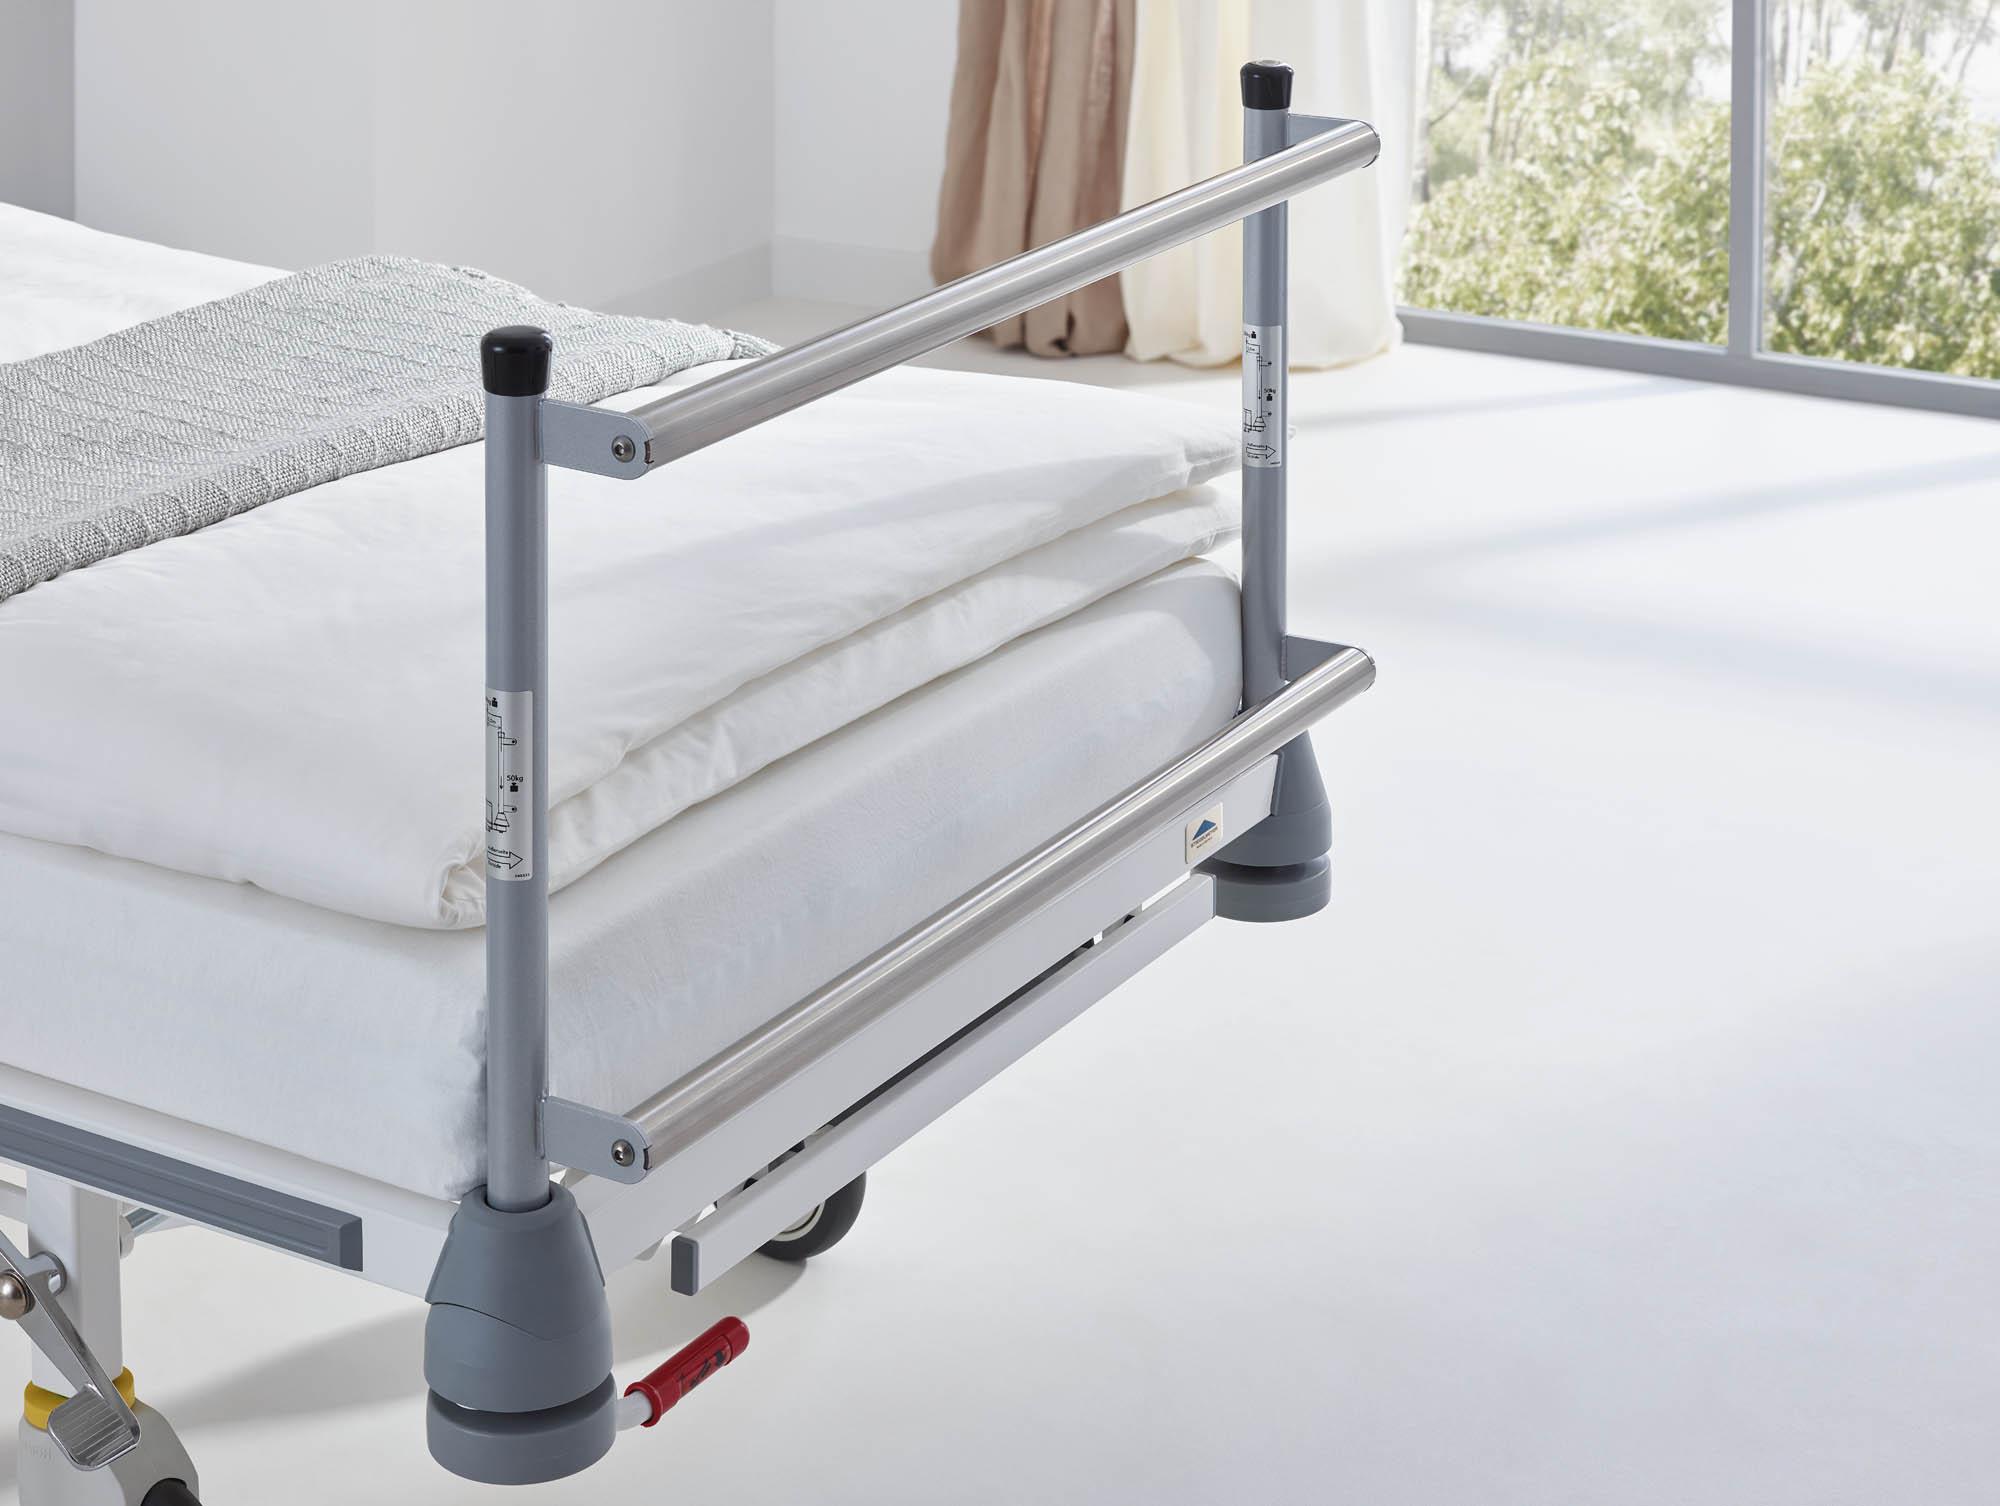 Das Extensionshaupt lässt sich auch am Krankenhausbett Vivendo pro anbringen.